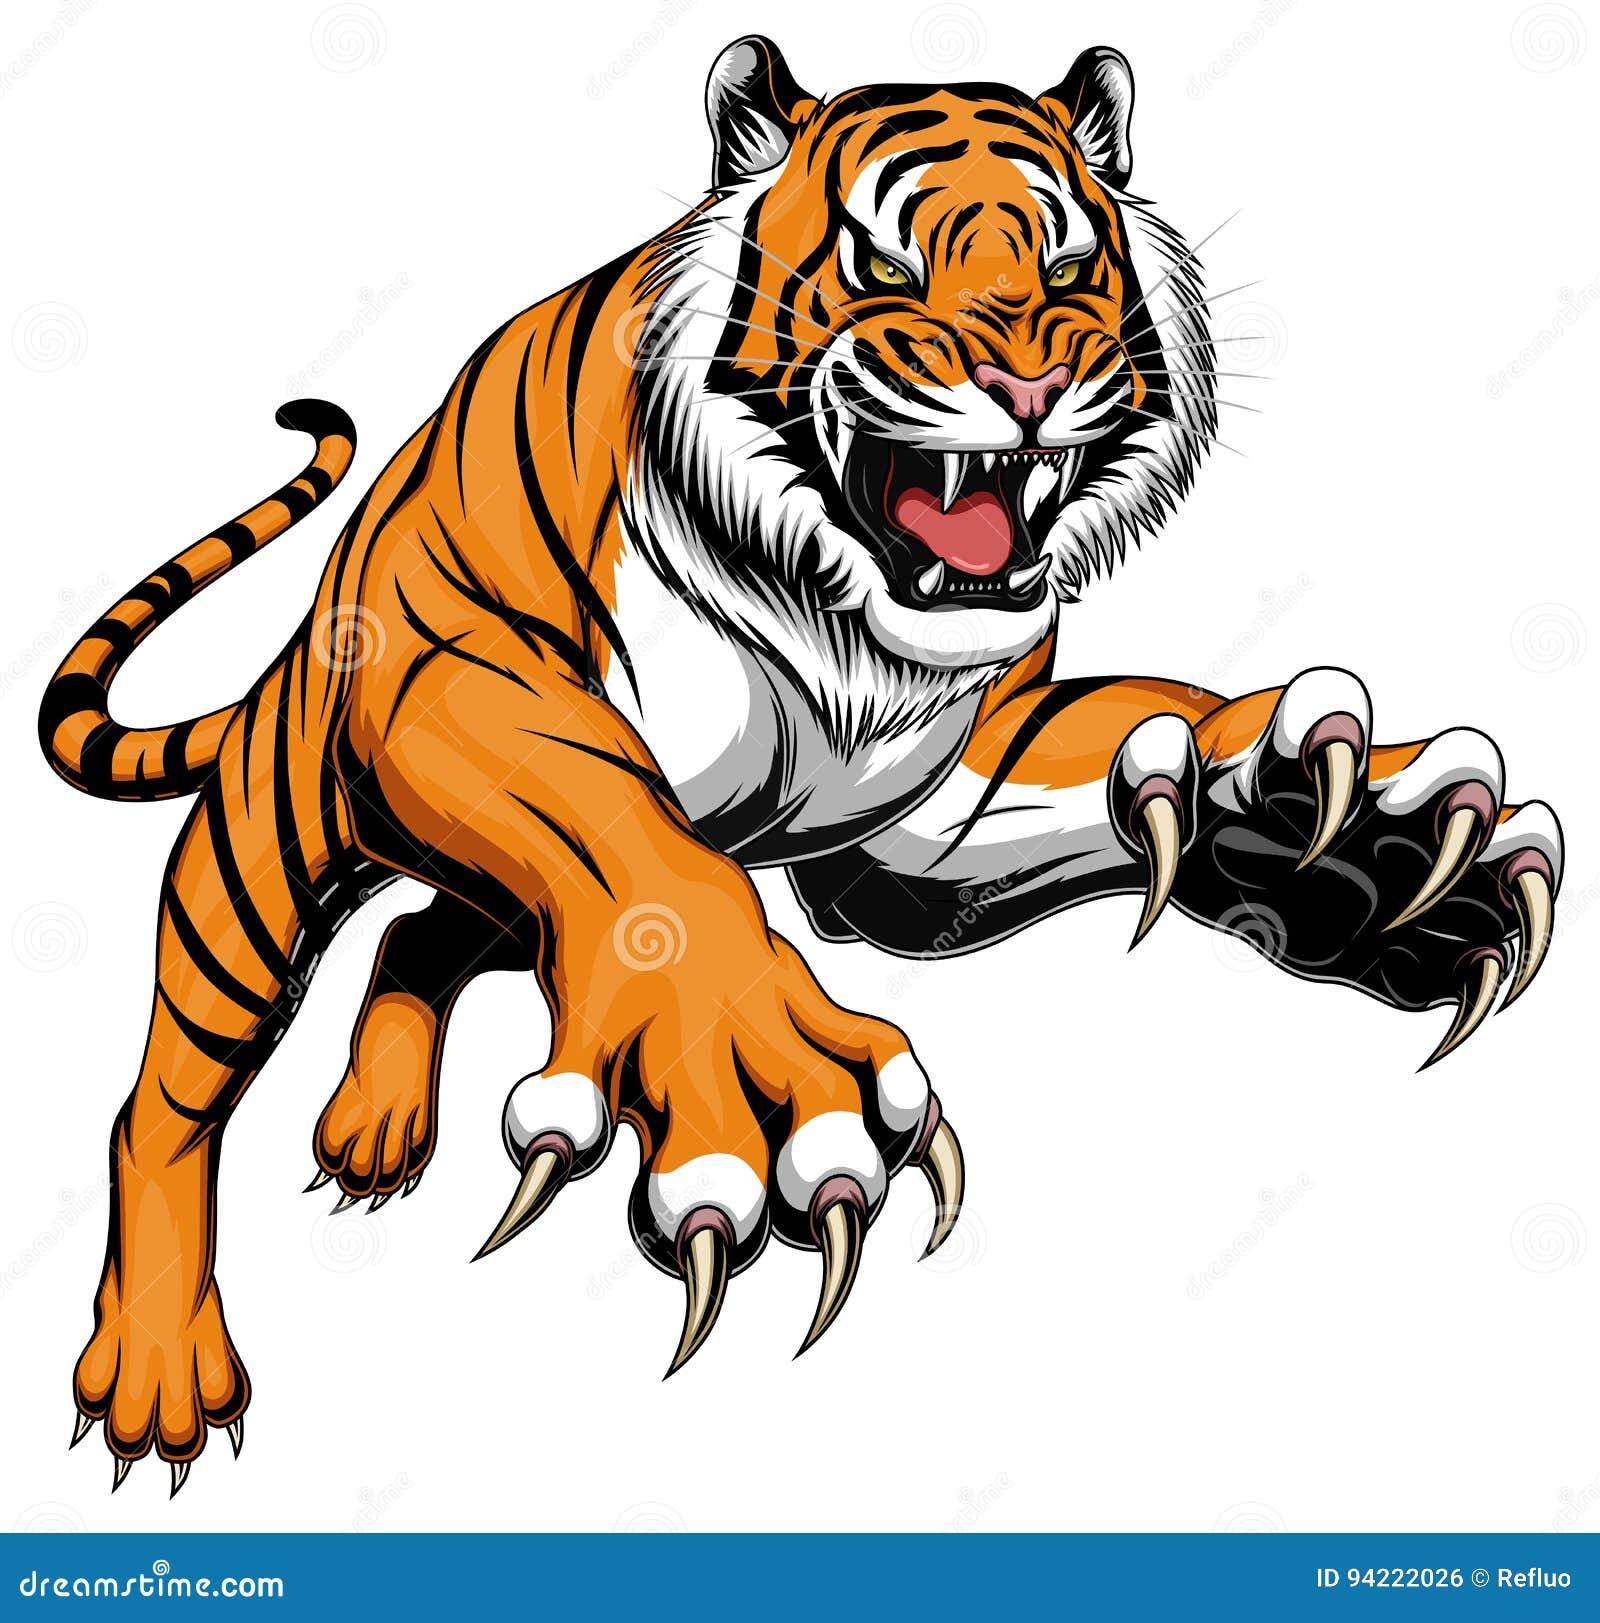 tiger stock illustrations 28 640 tiger stock illustrations